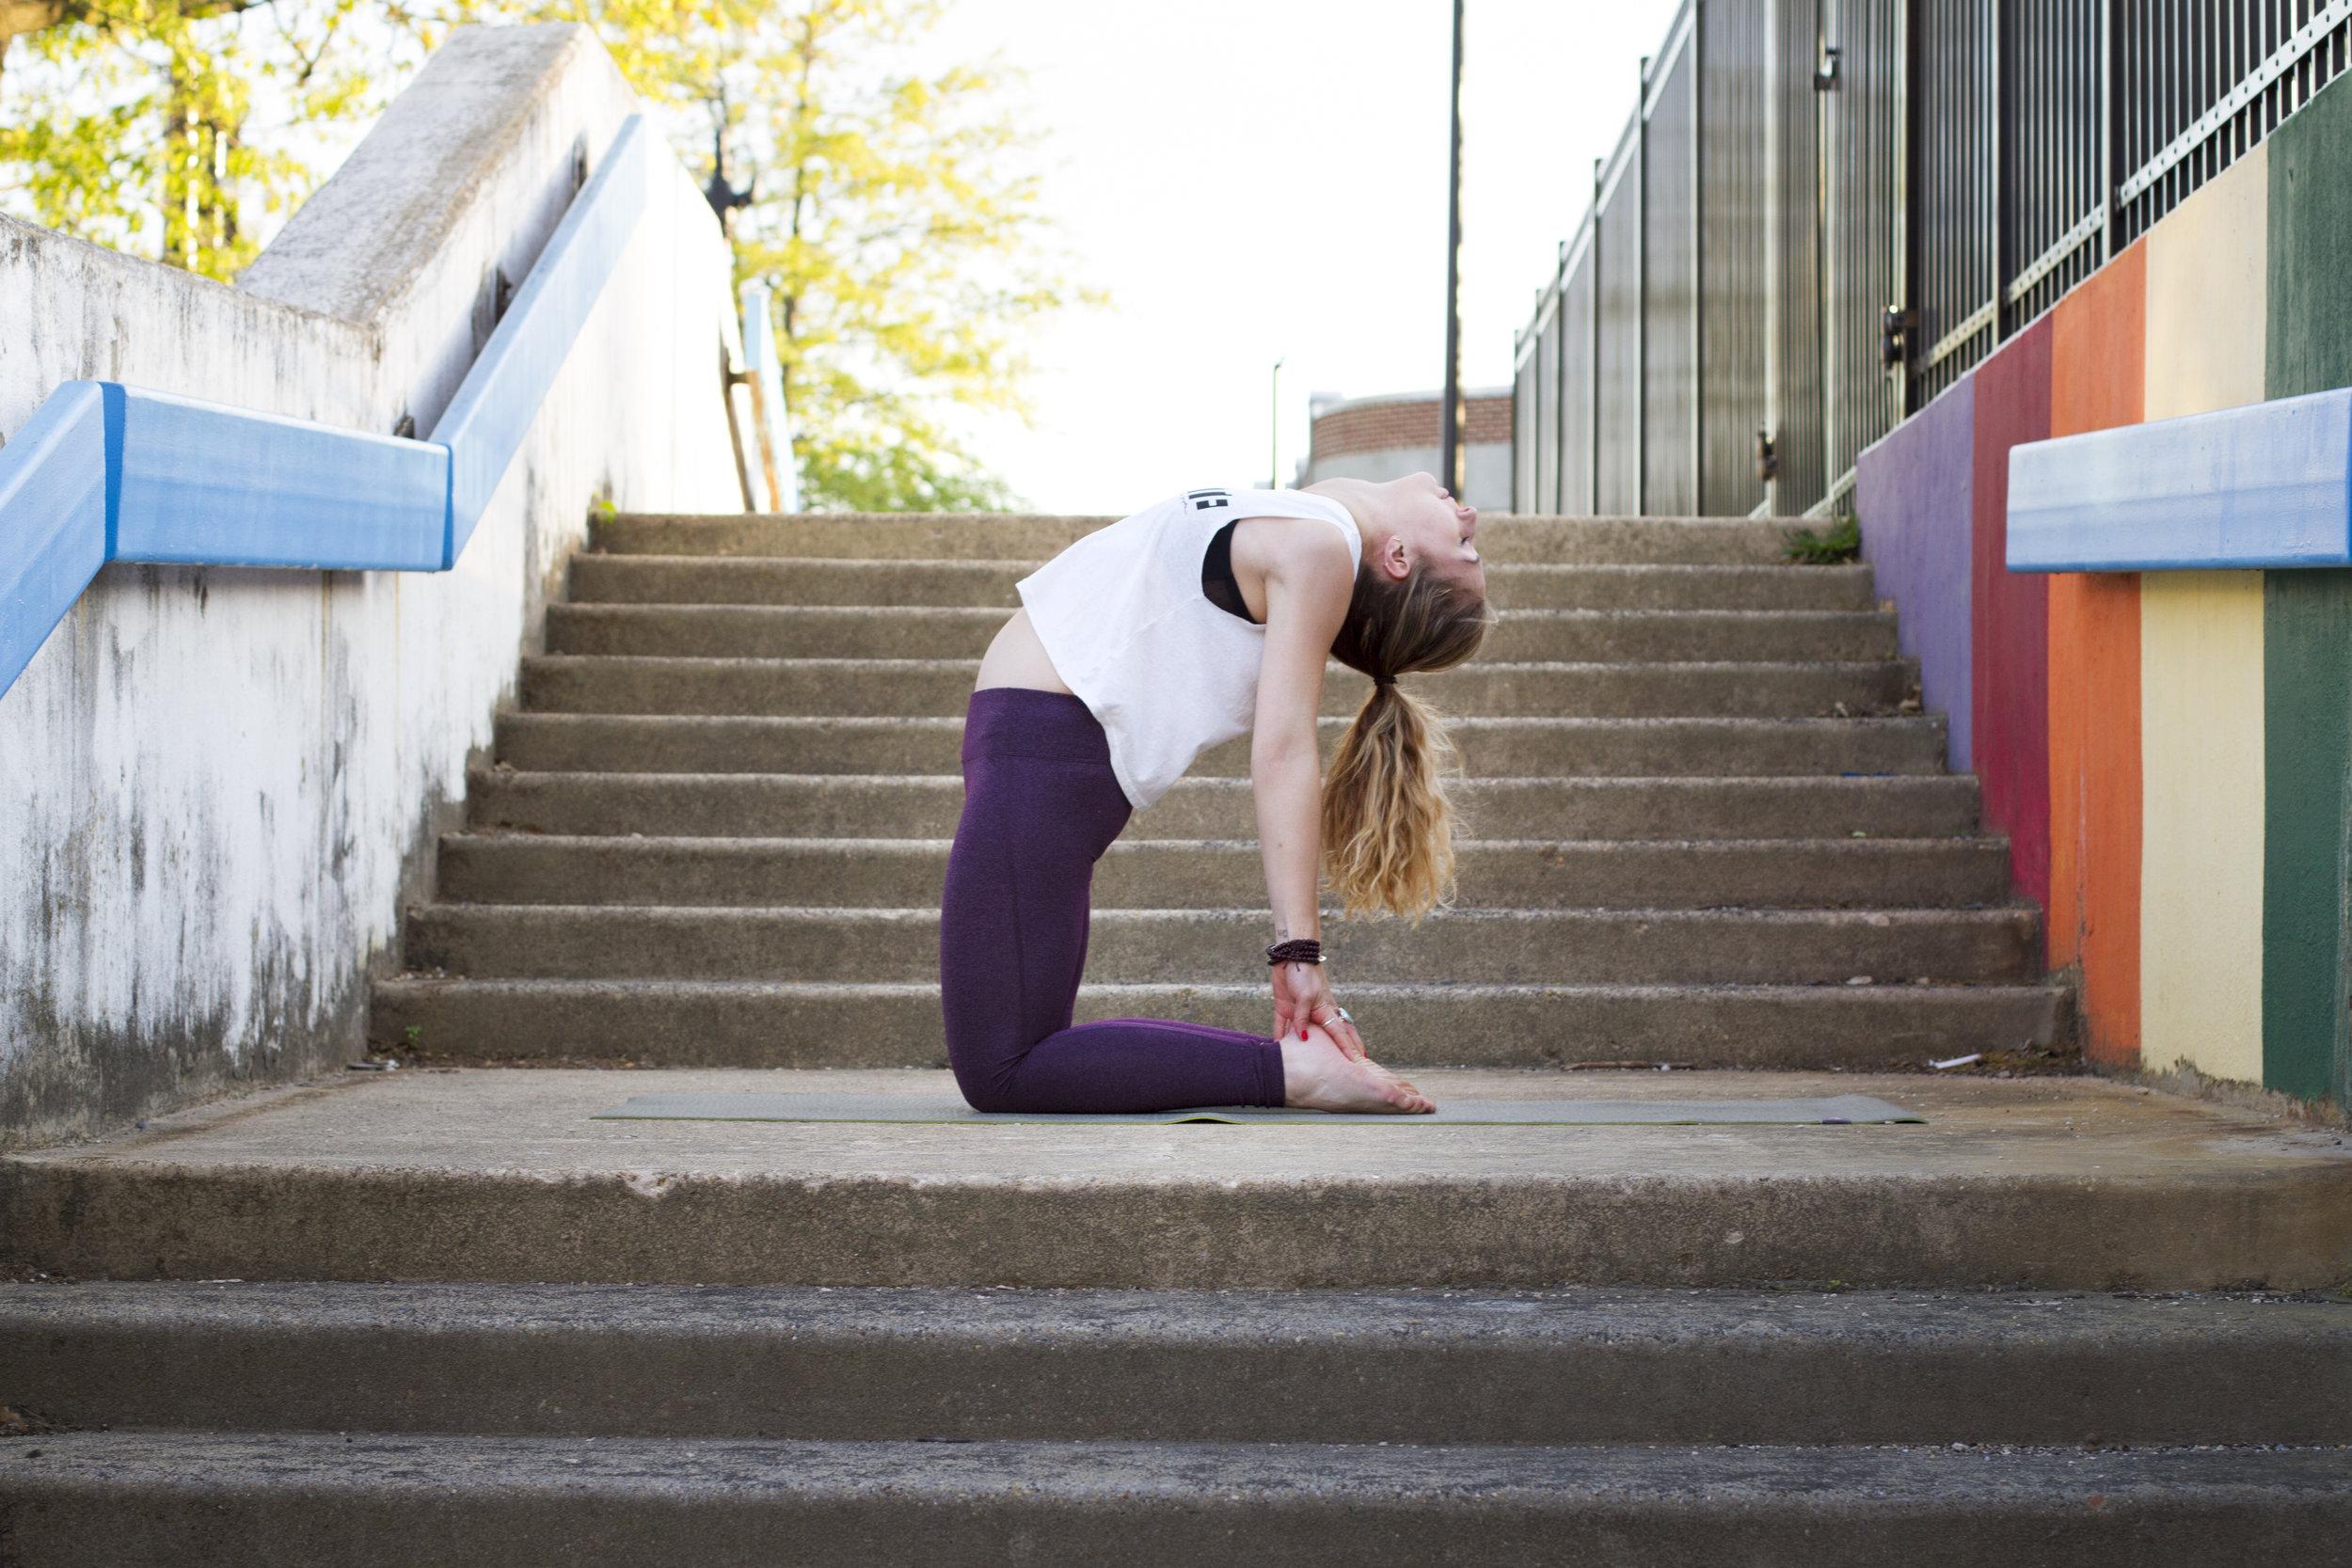 dc-md-va-yoga-fitness-photographer-affordable-1.jpg